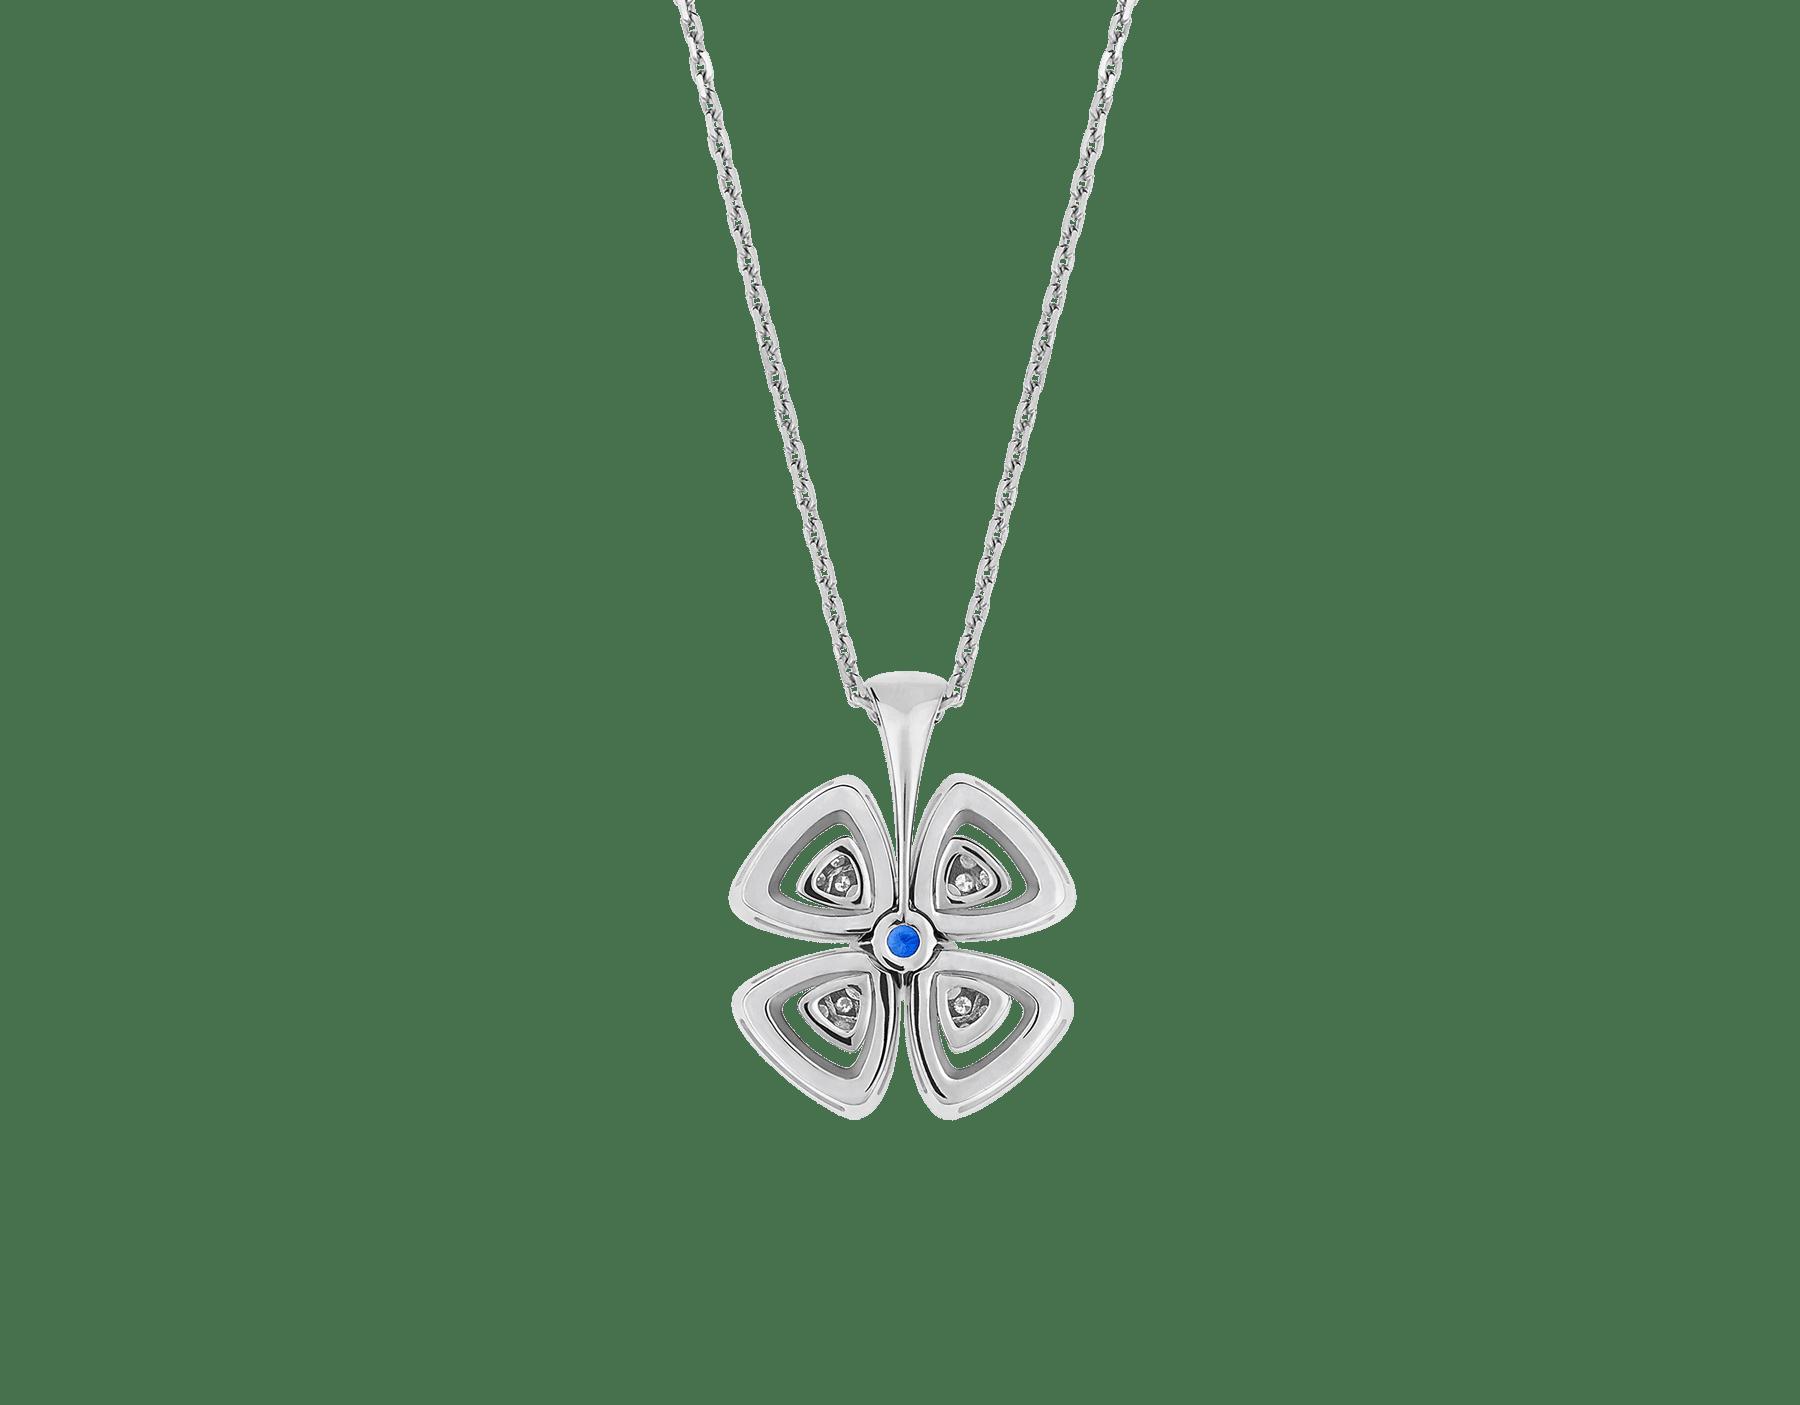 Fiorever 18K 白金項鍊,鑲飾 1 顆明亮型切割藍寶石(0.43 克拉)和密鑲鑽石(0.31 克拉)。 358426 image 4